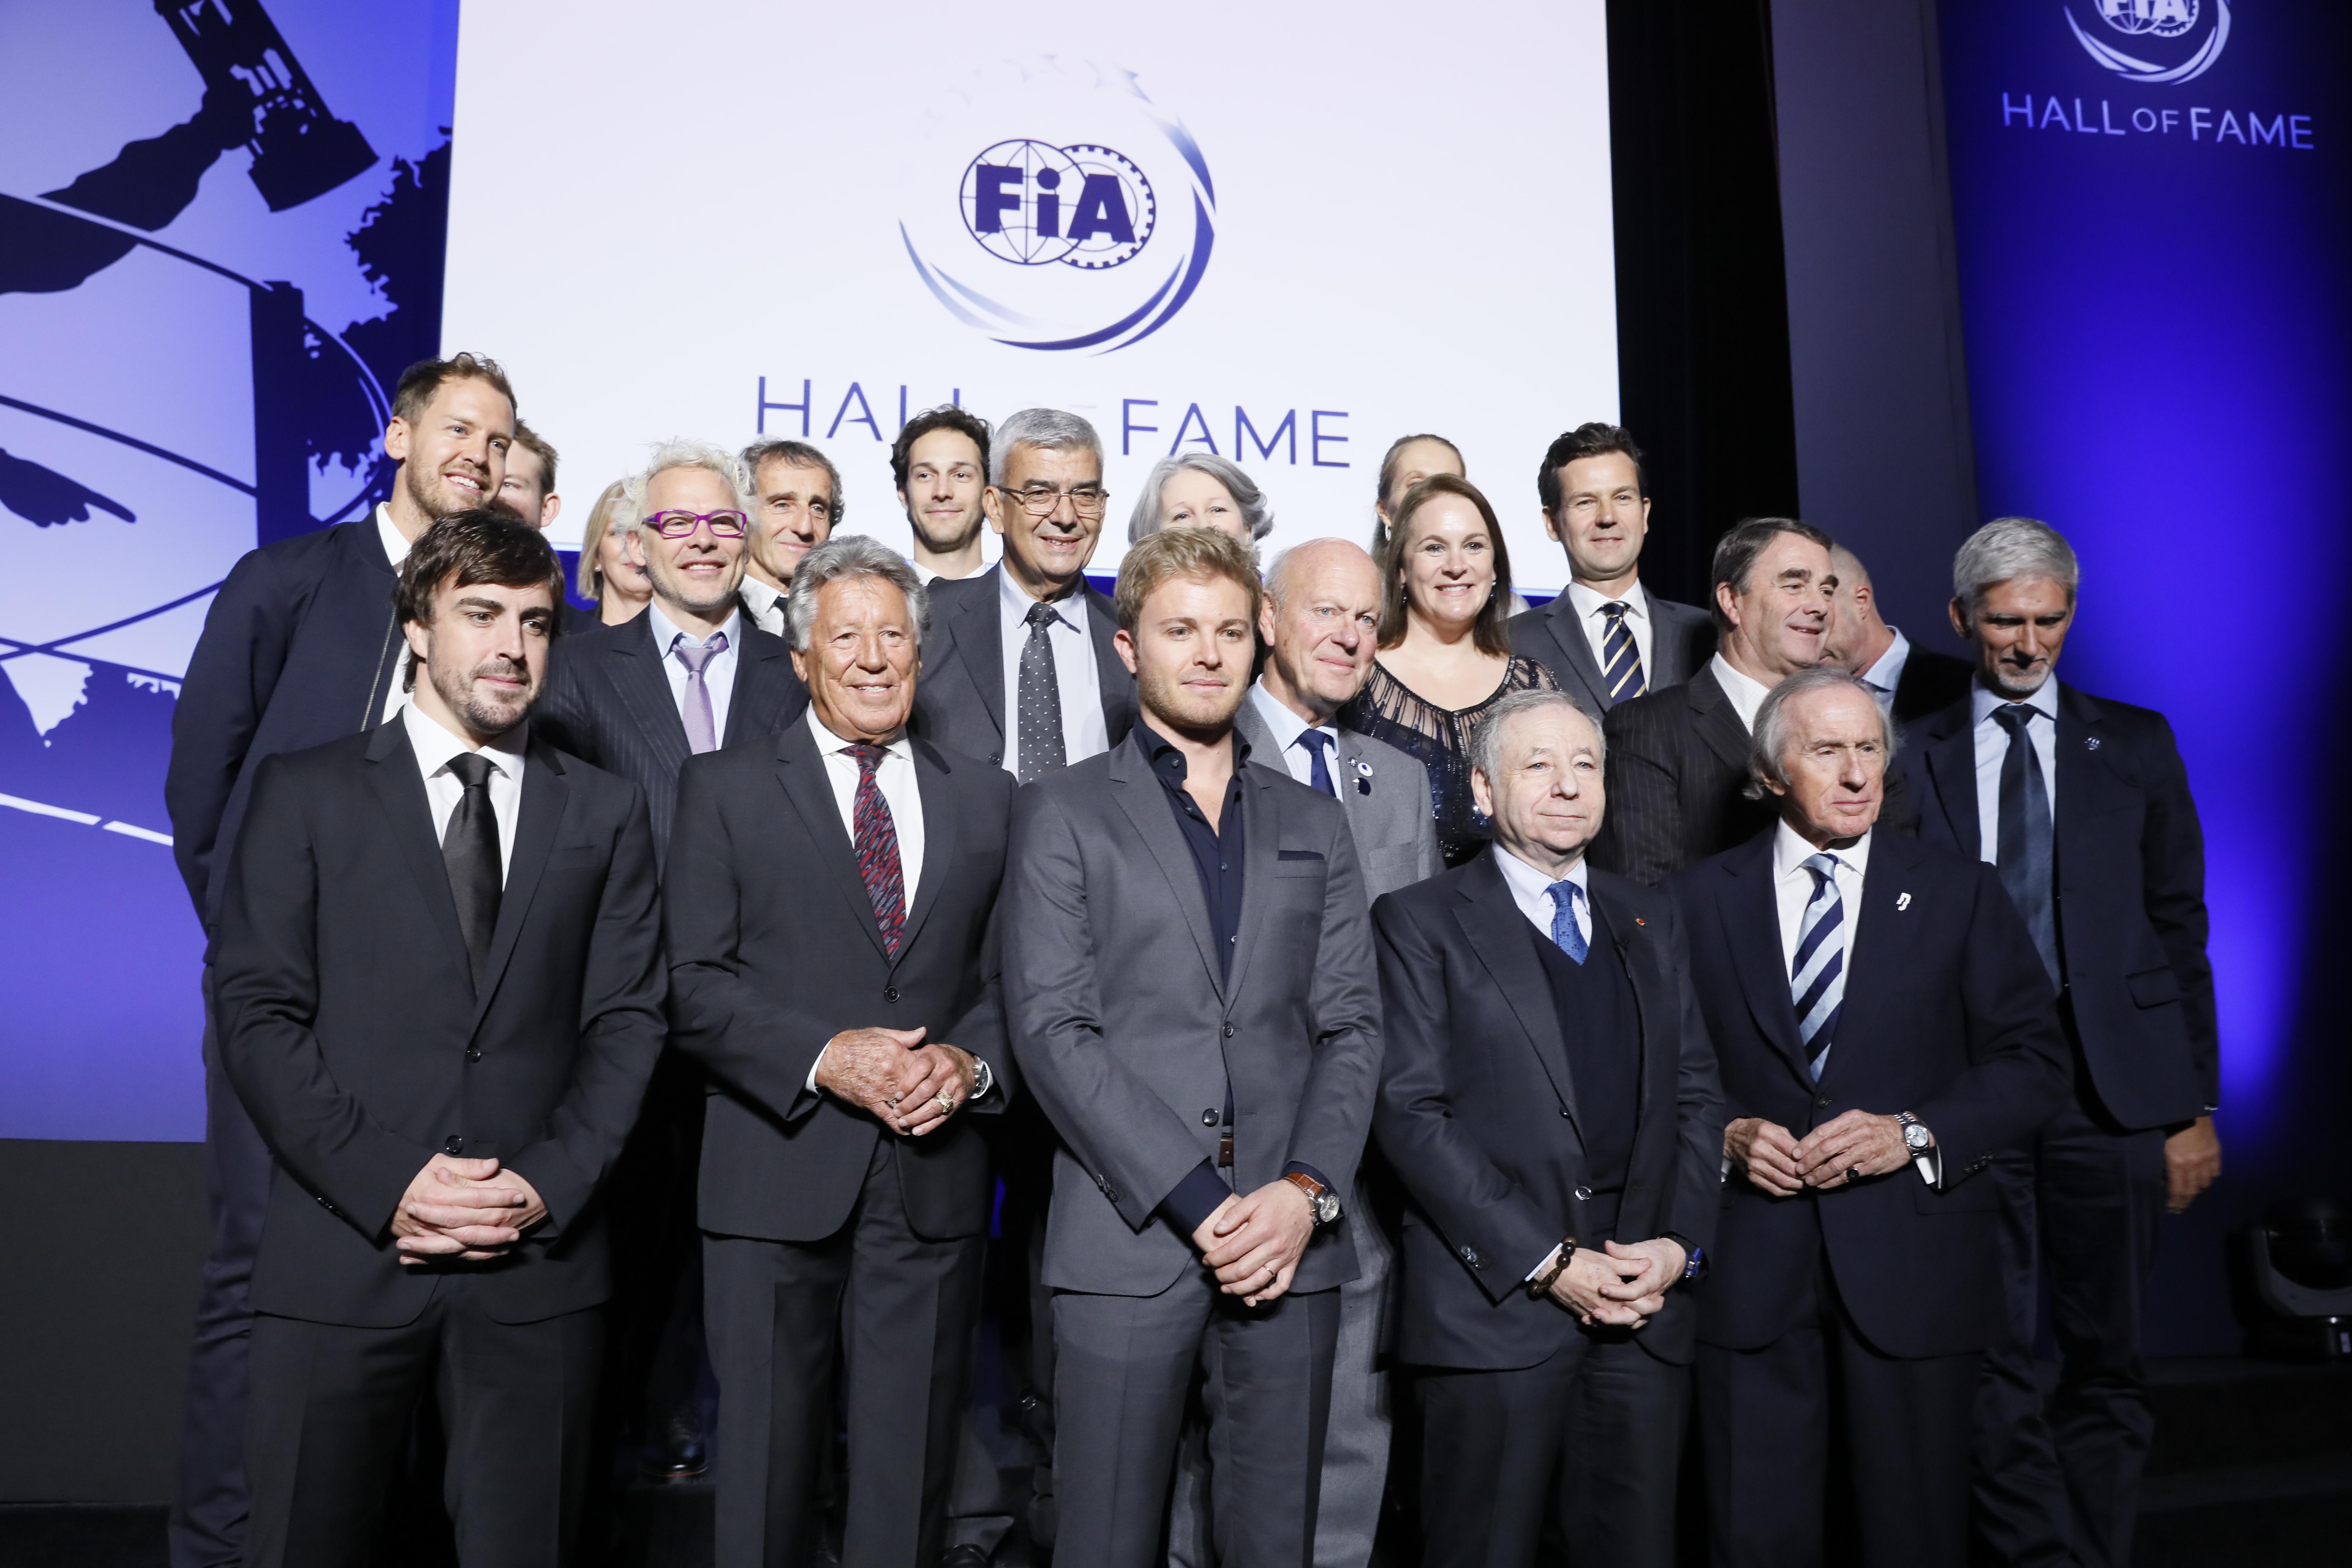 2017 FIA Hall of Fame - Inauguration